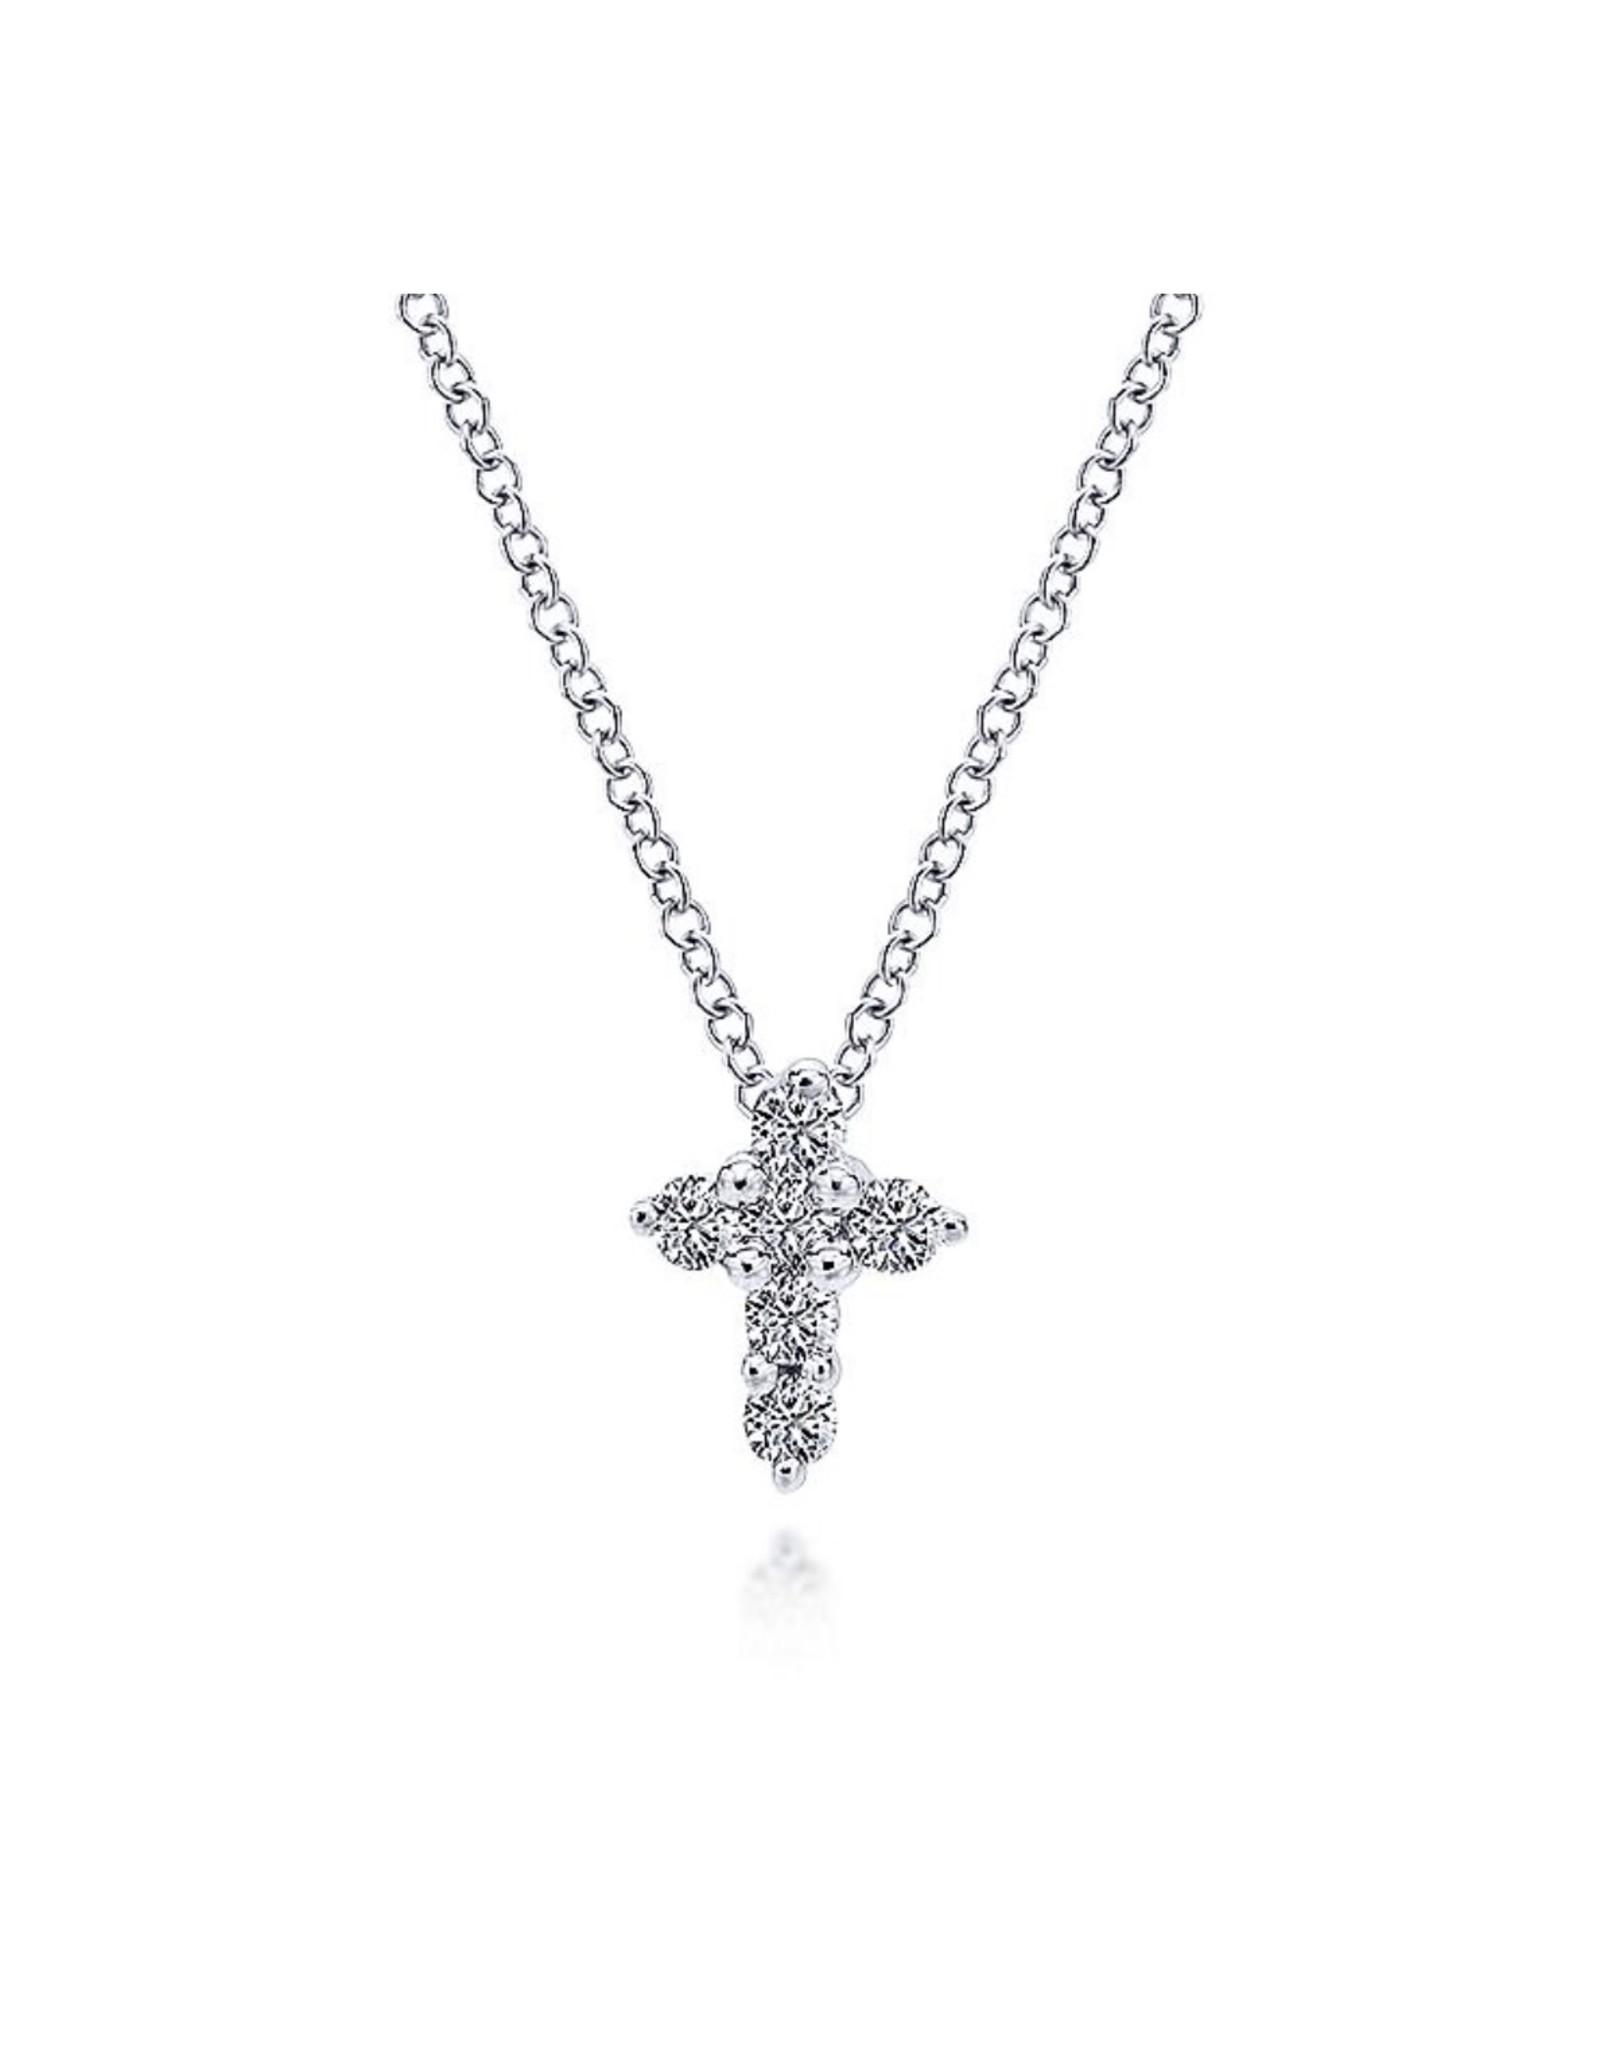 14K White Gold Tiny Diamond Cross Necklace, D: 0.10ct